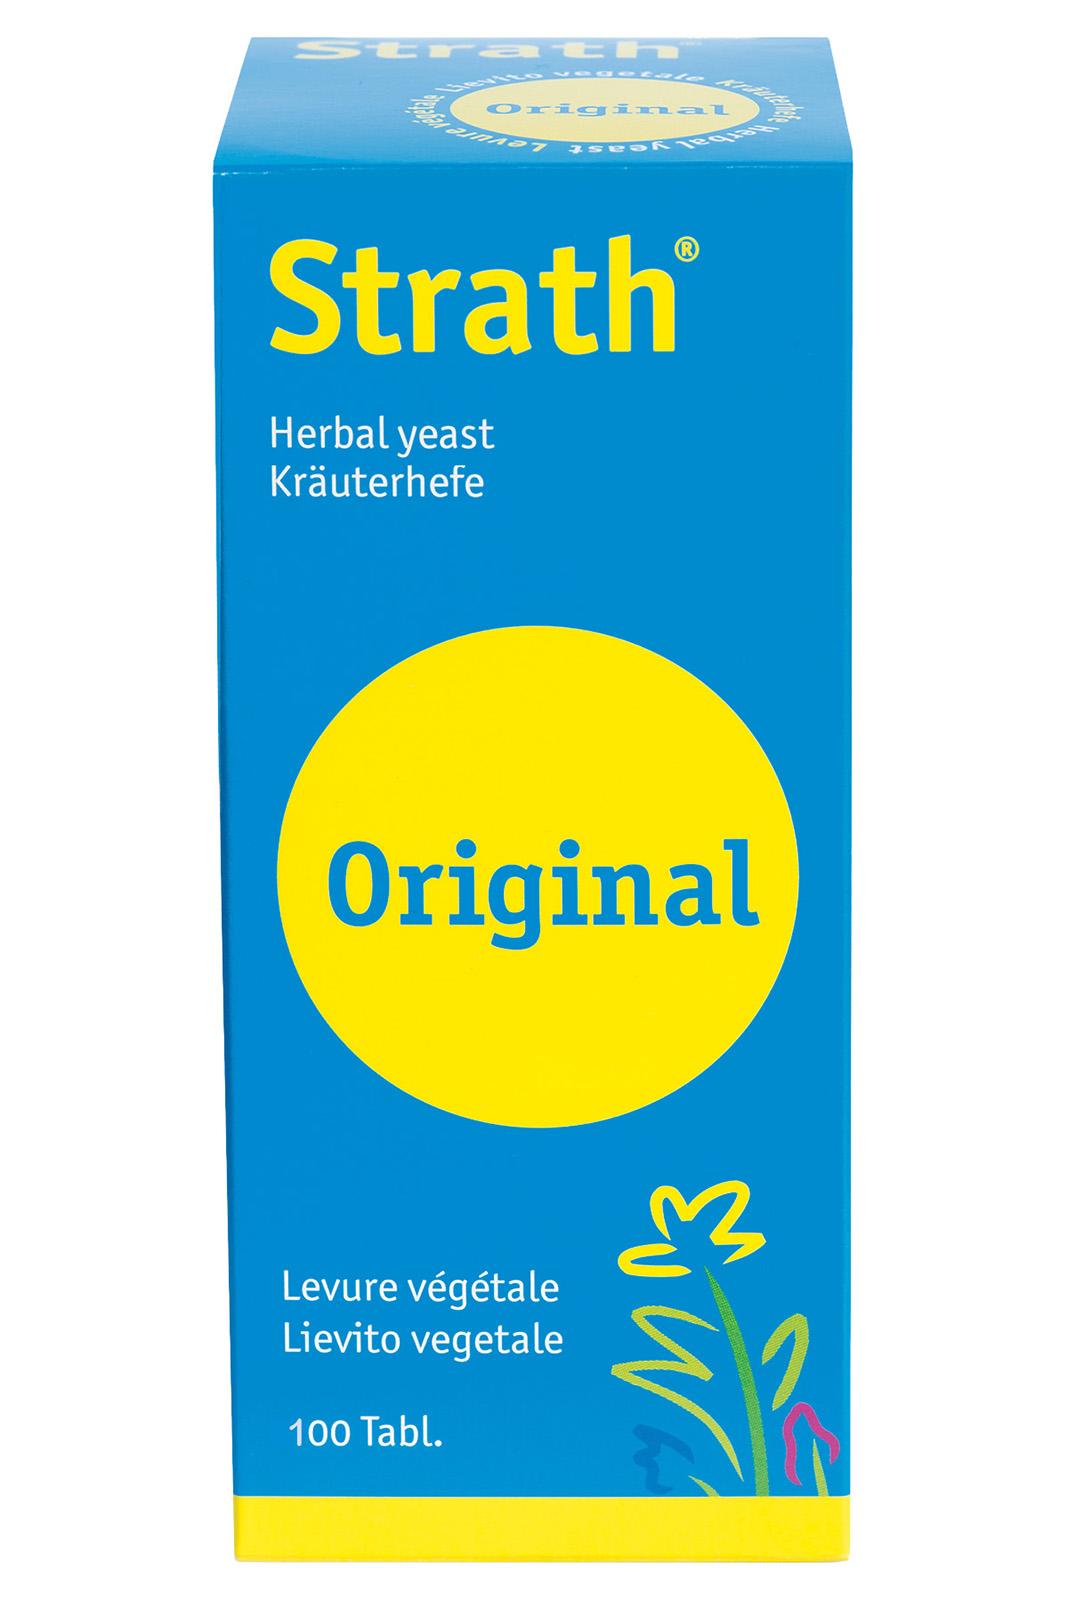 Strath Original Tablets 100's